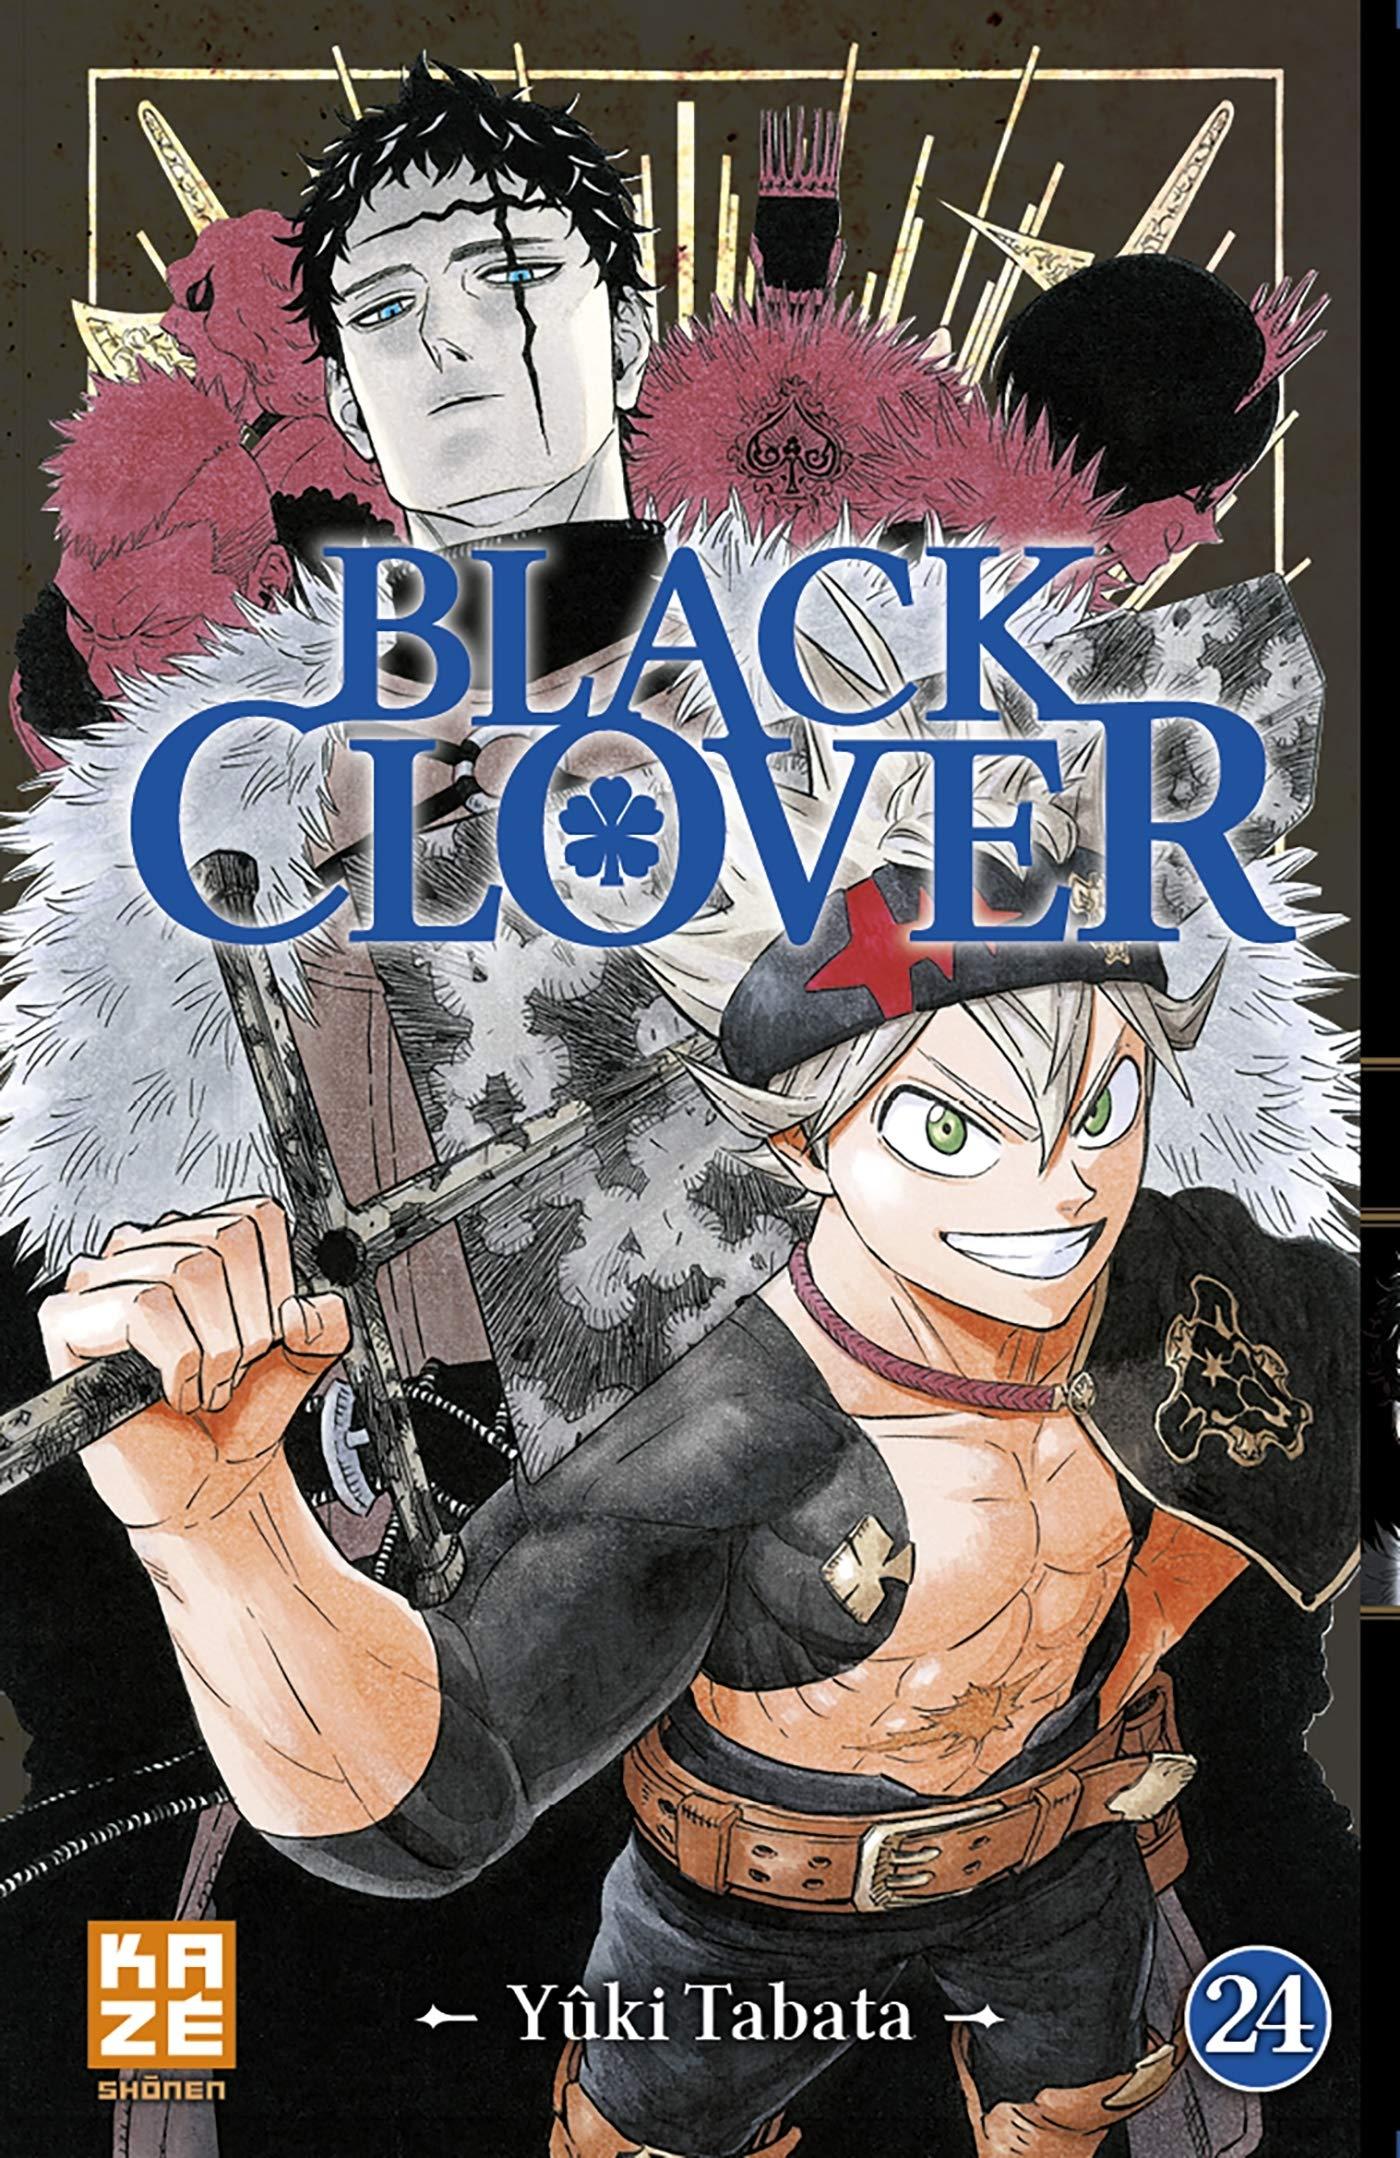 Black Clover 24